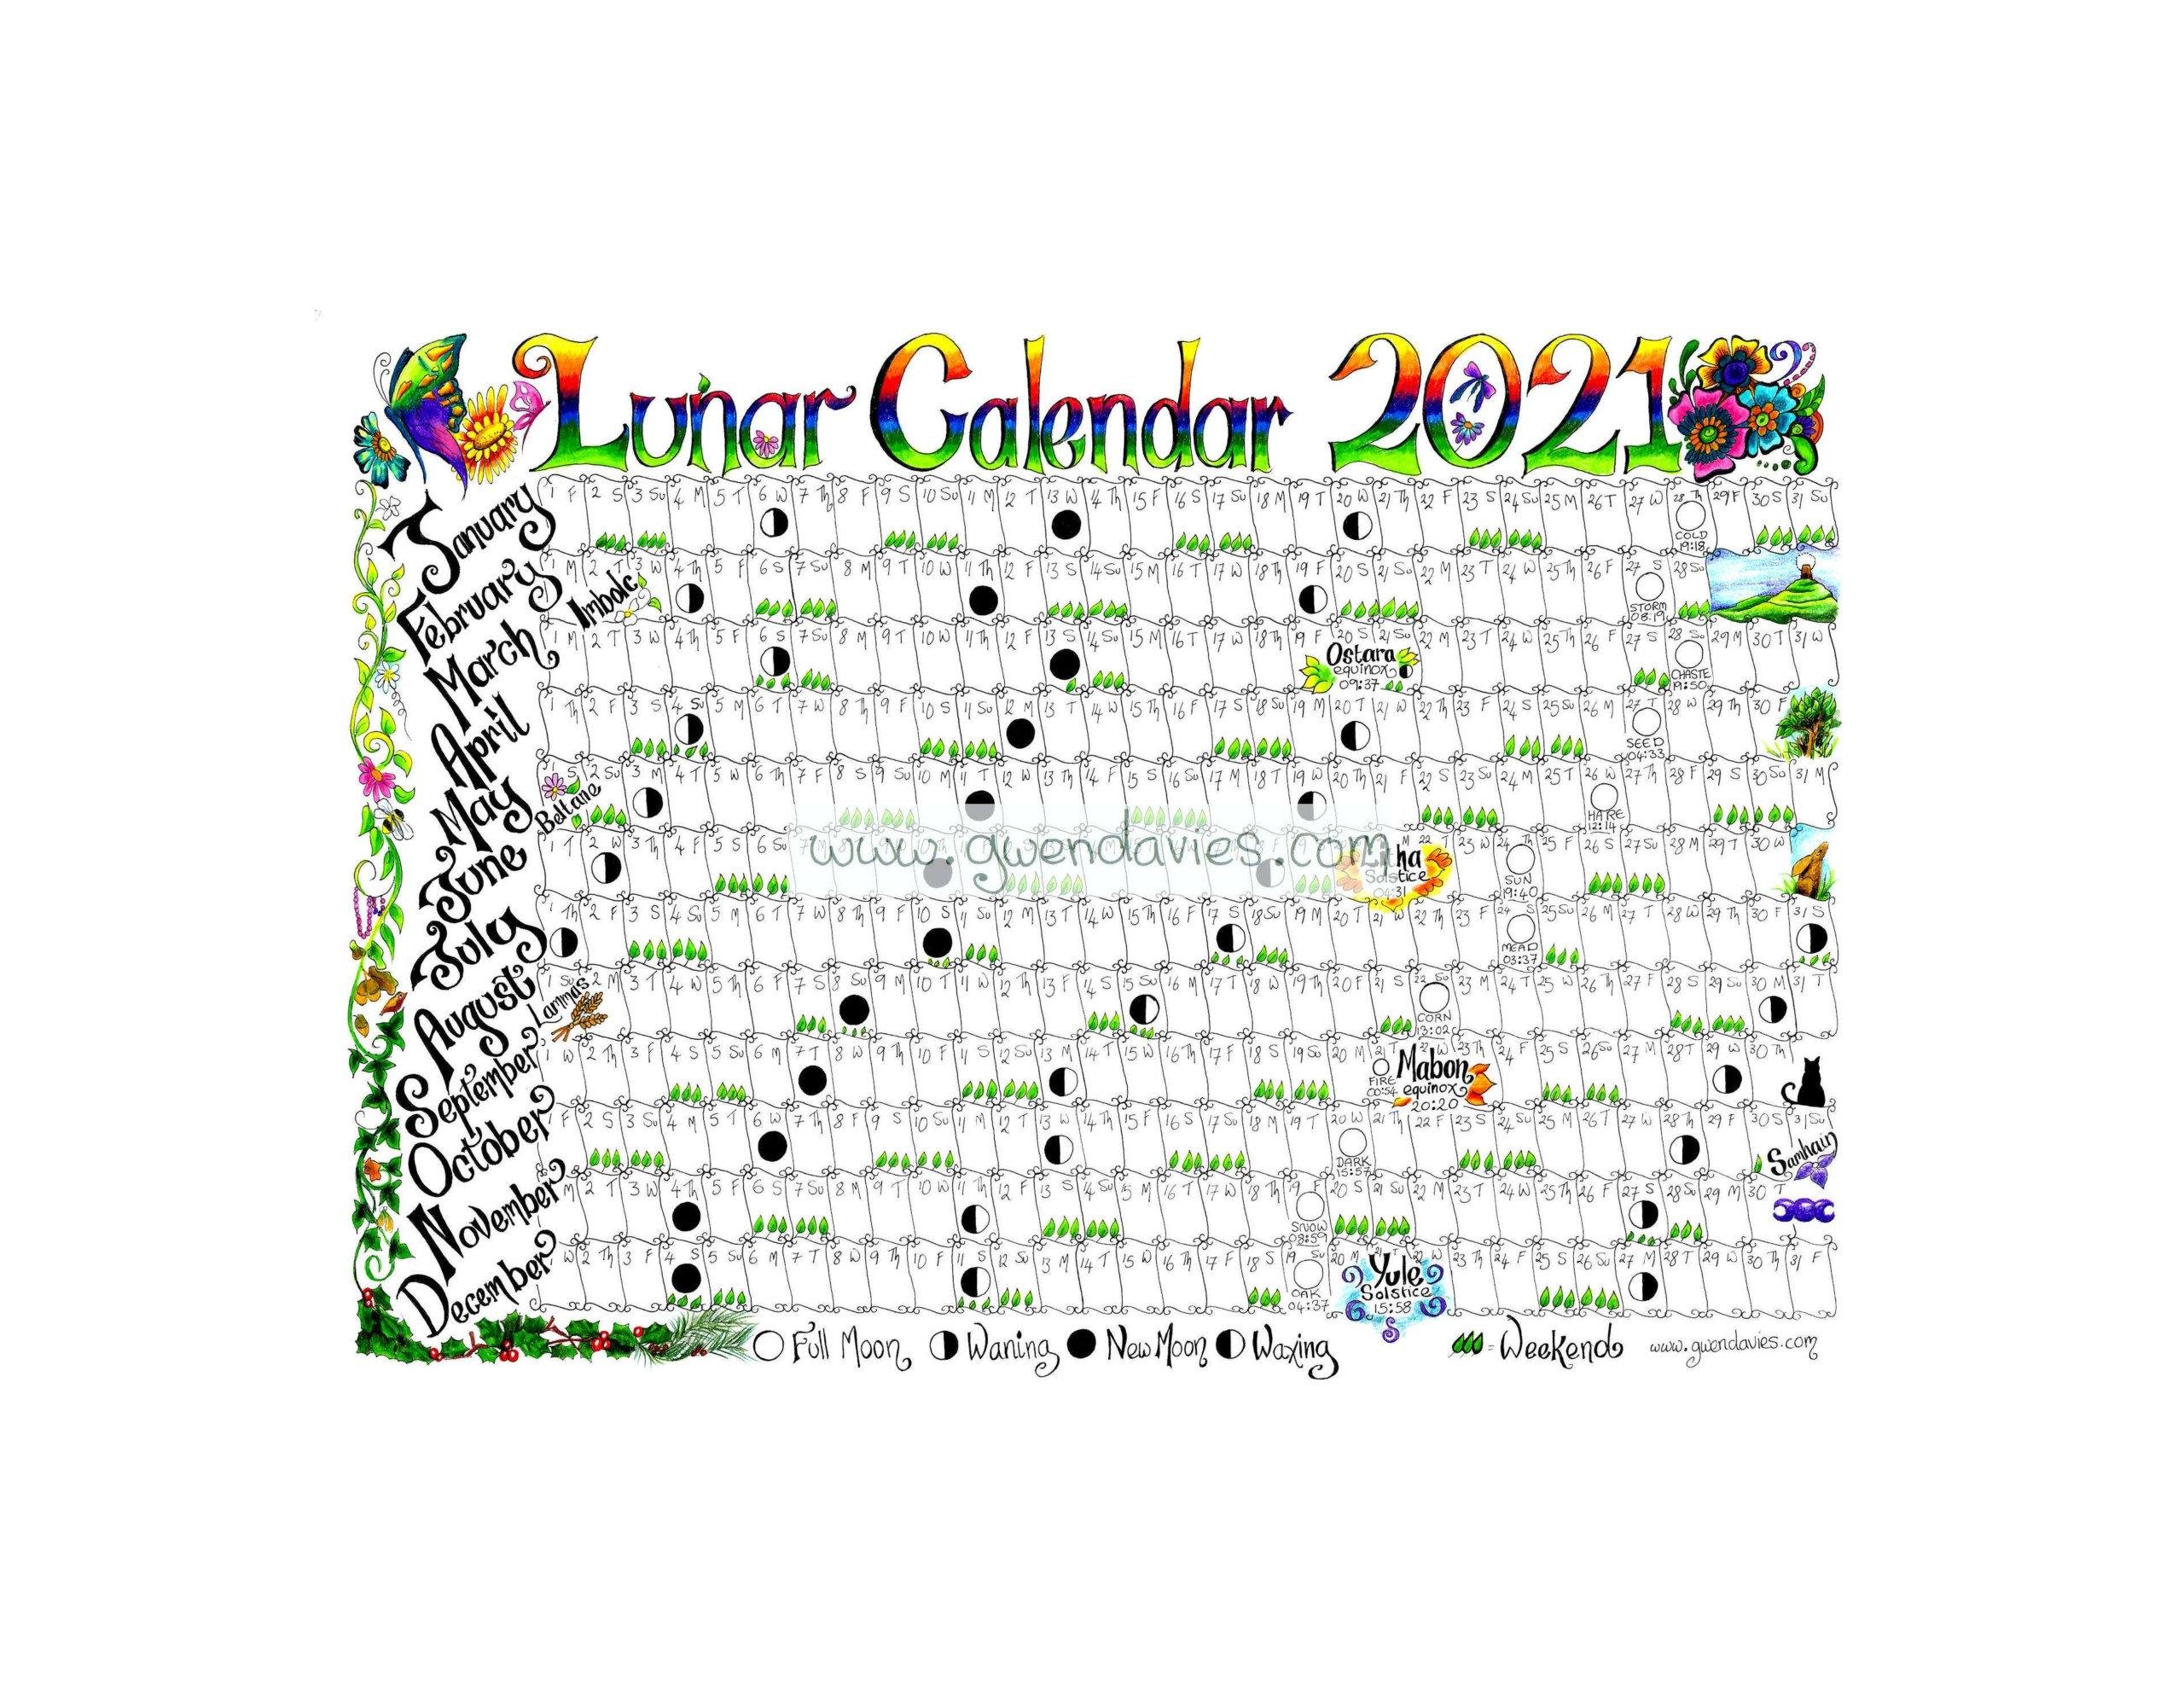 2021 Full Moon Calendar | 2021 Printable Calendars regarding Lunar Calendar 2021 Picture Healer